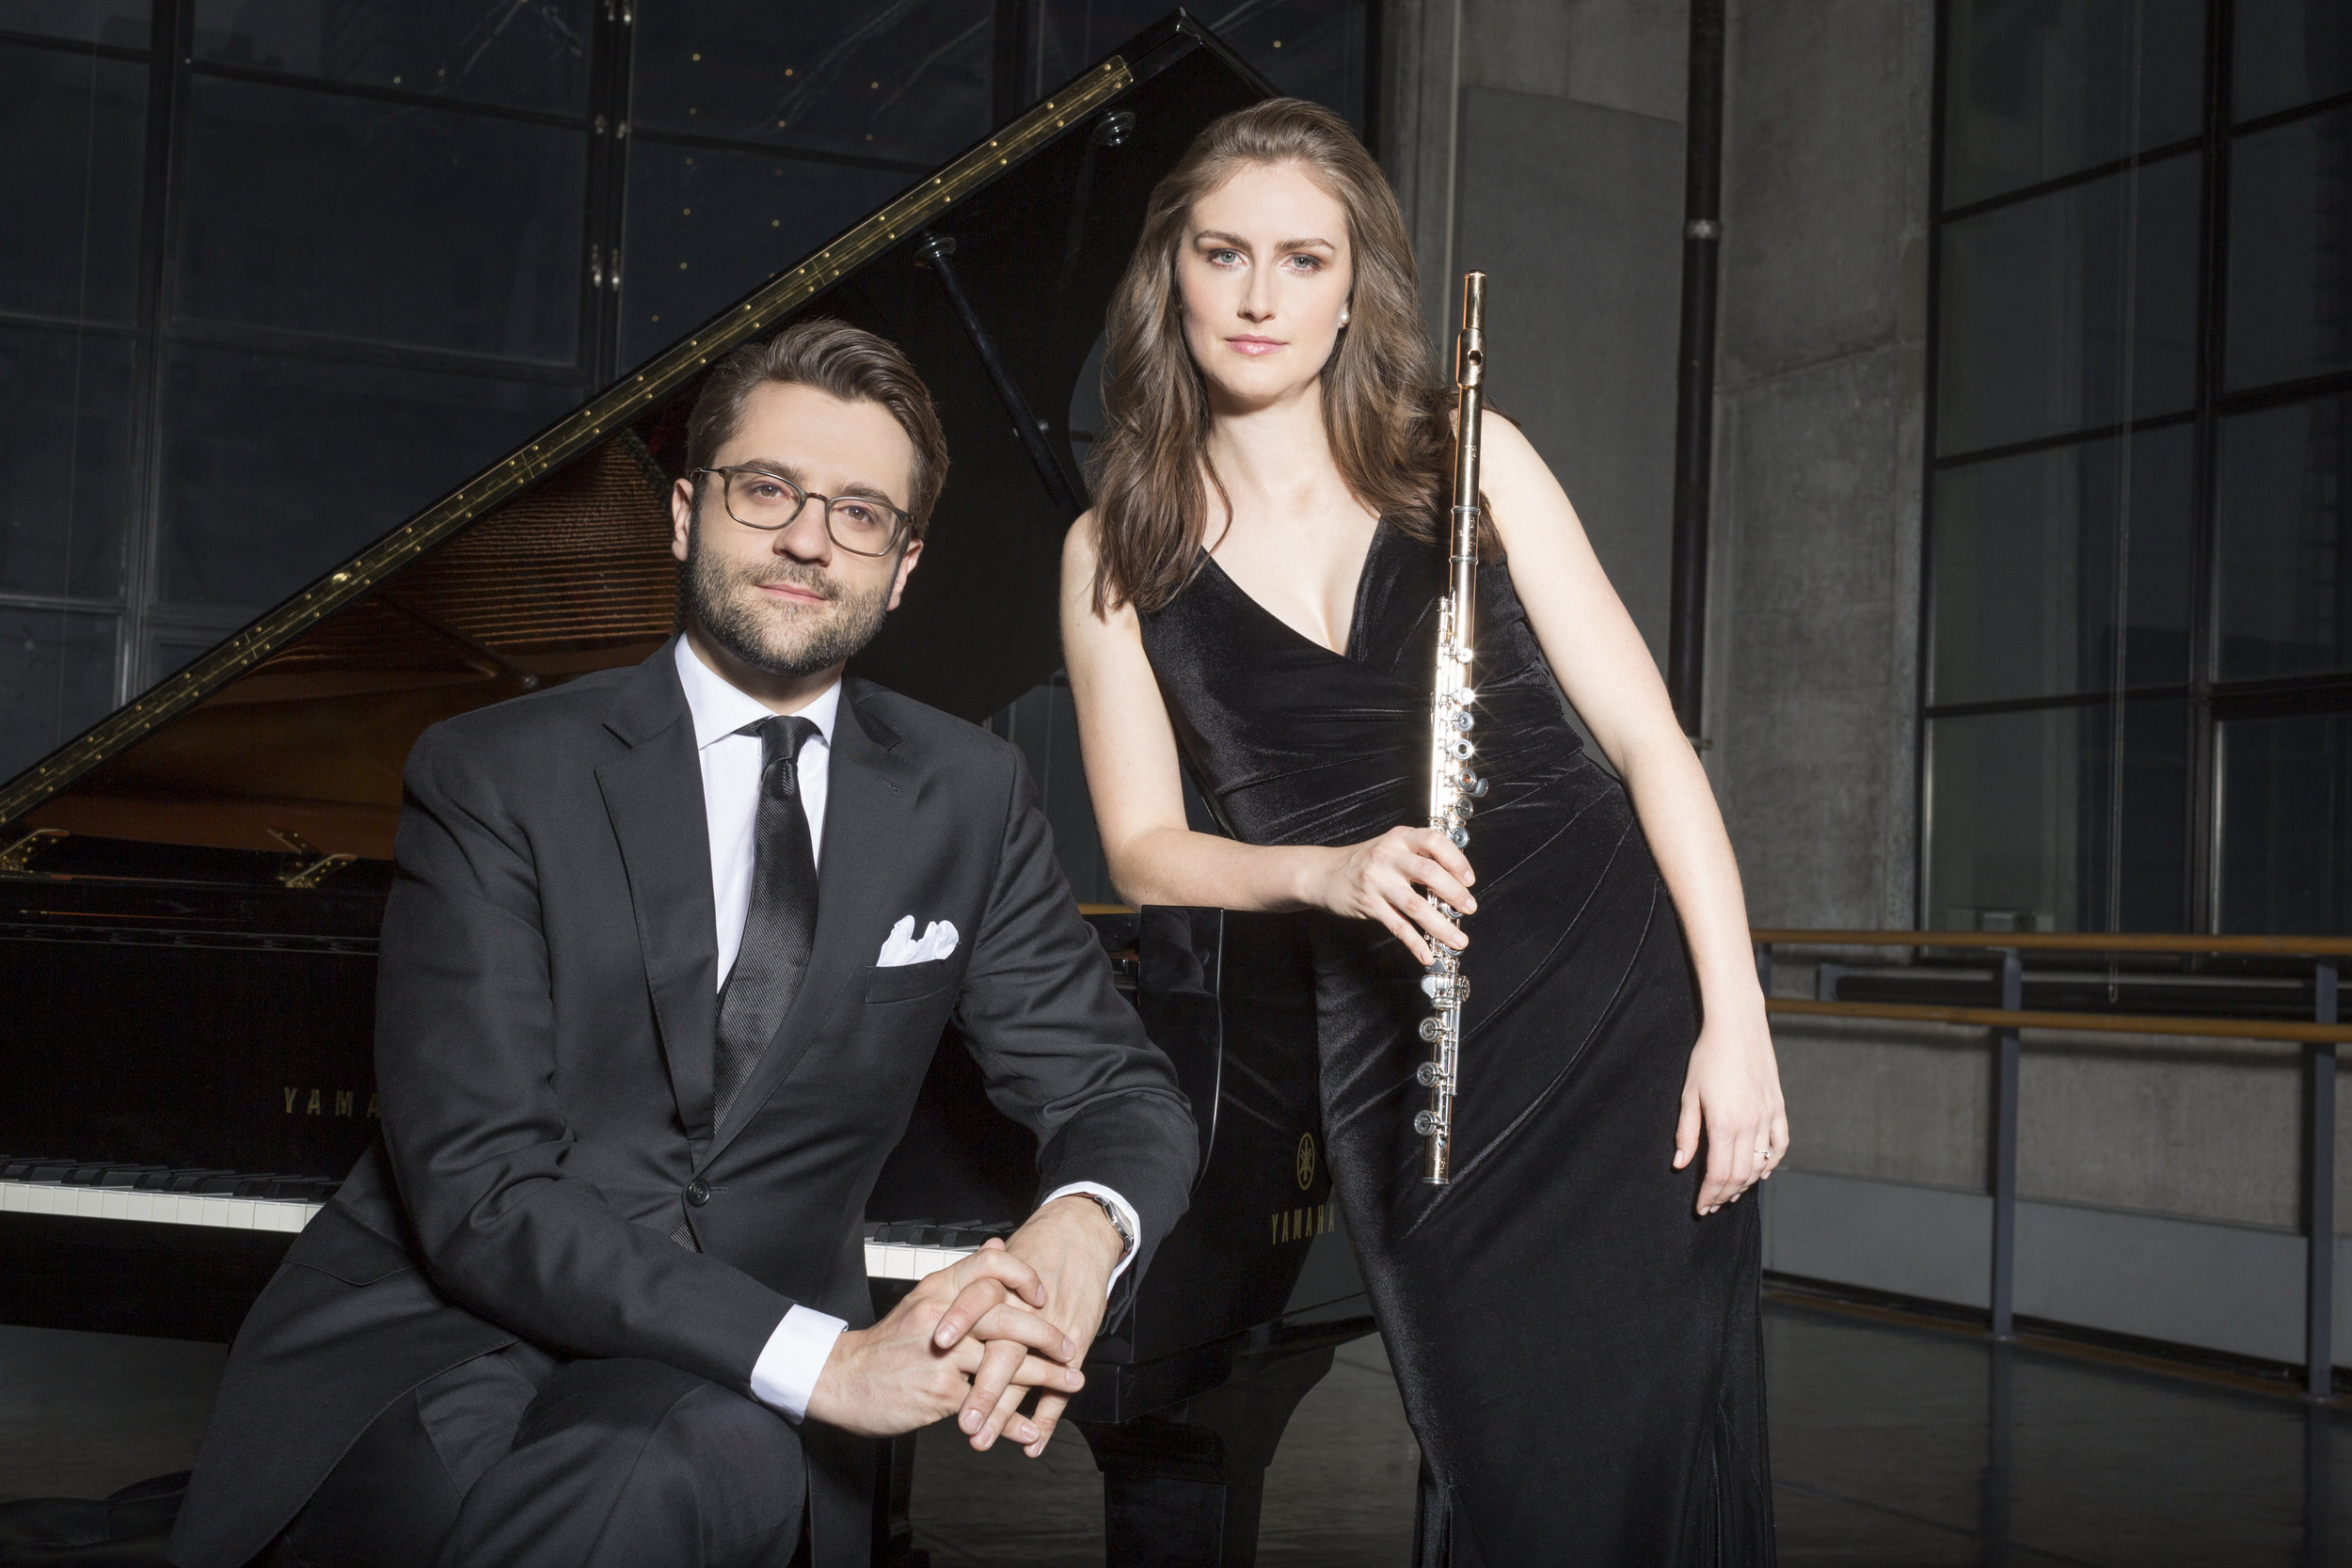 Catherine Gregory and David Kaplan, Dario Acosta, 2017